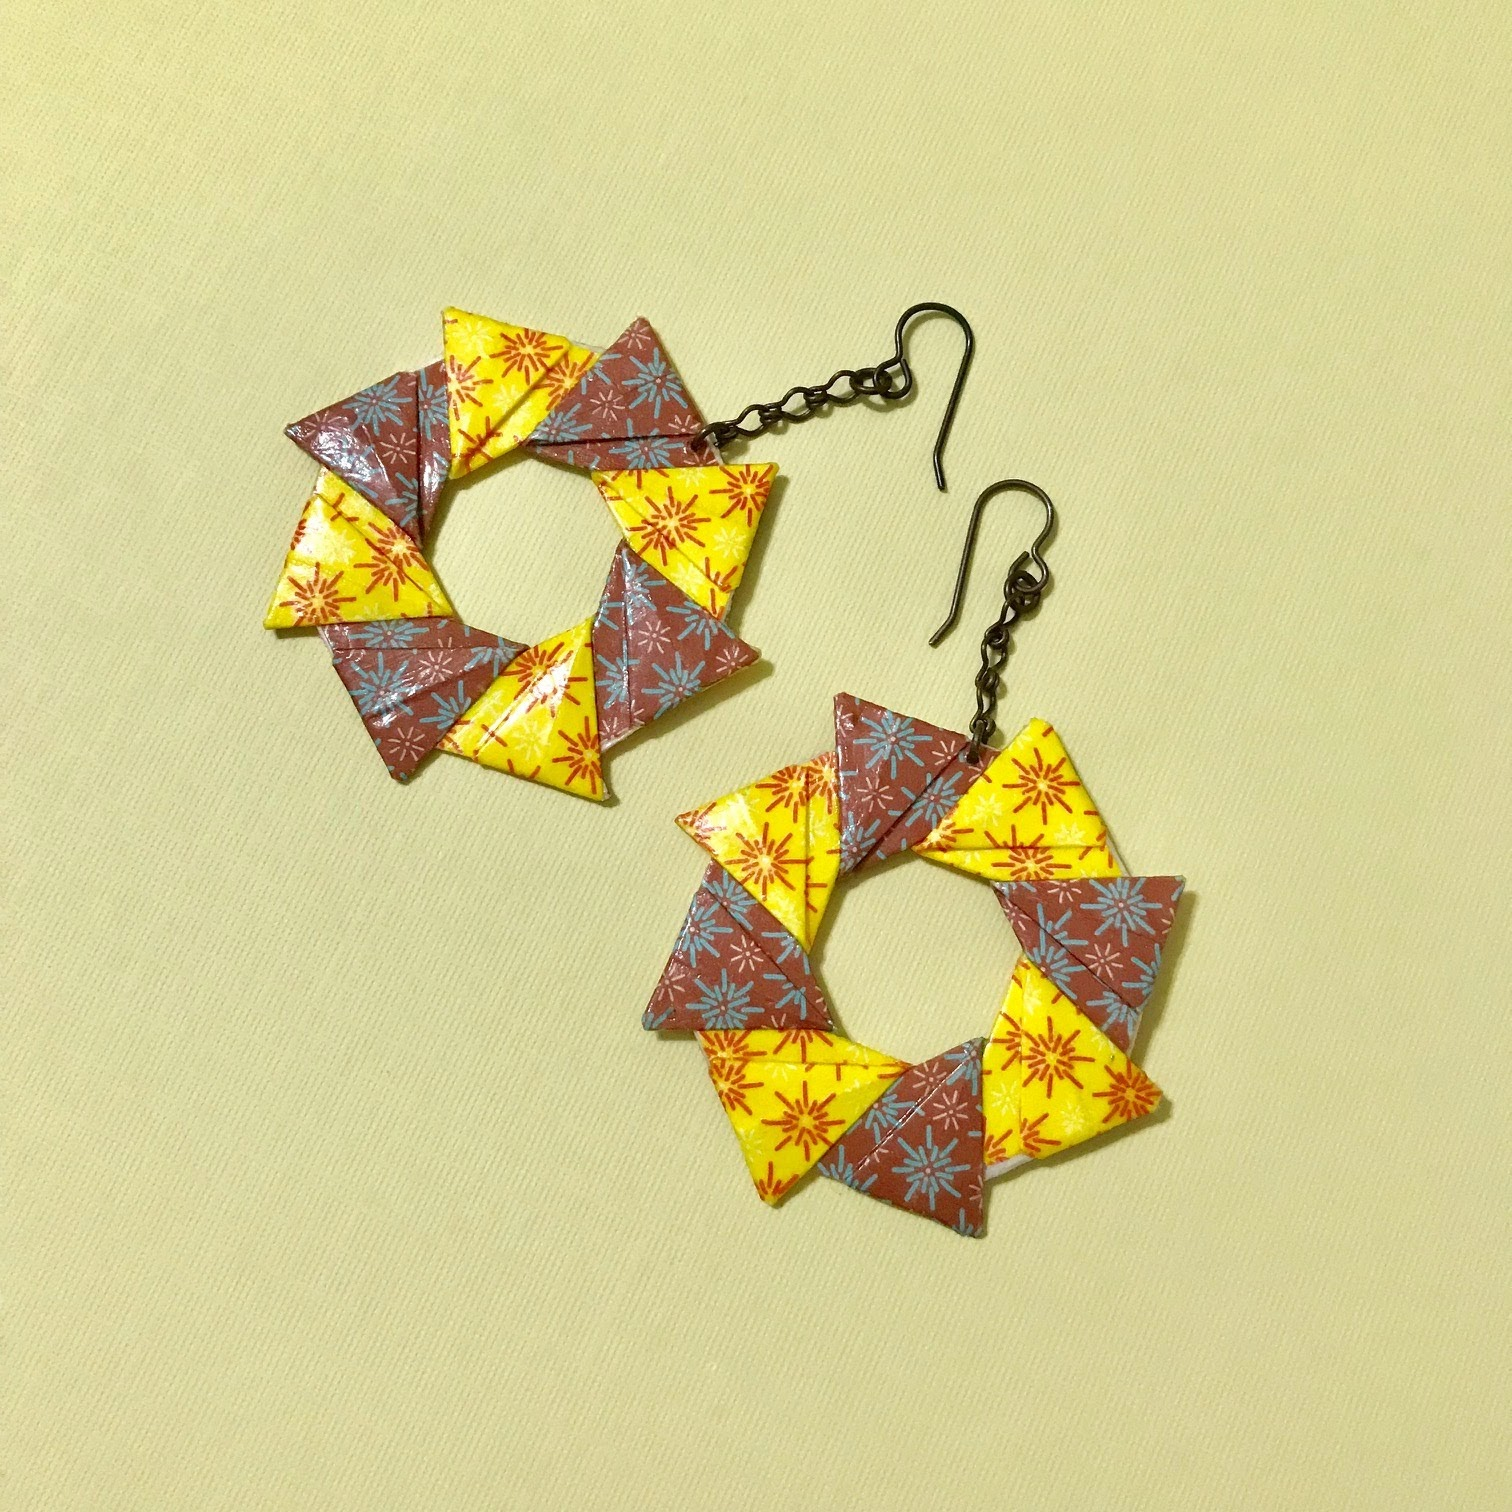 Origami Ring Earrings Tomoko Fuse